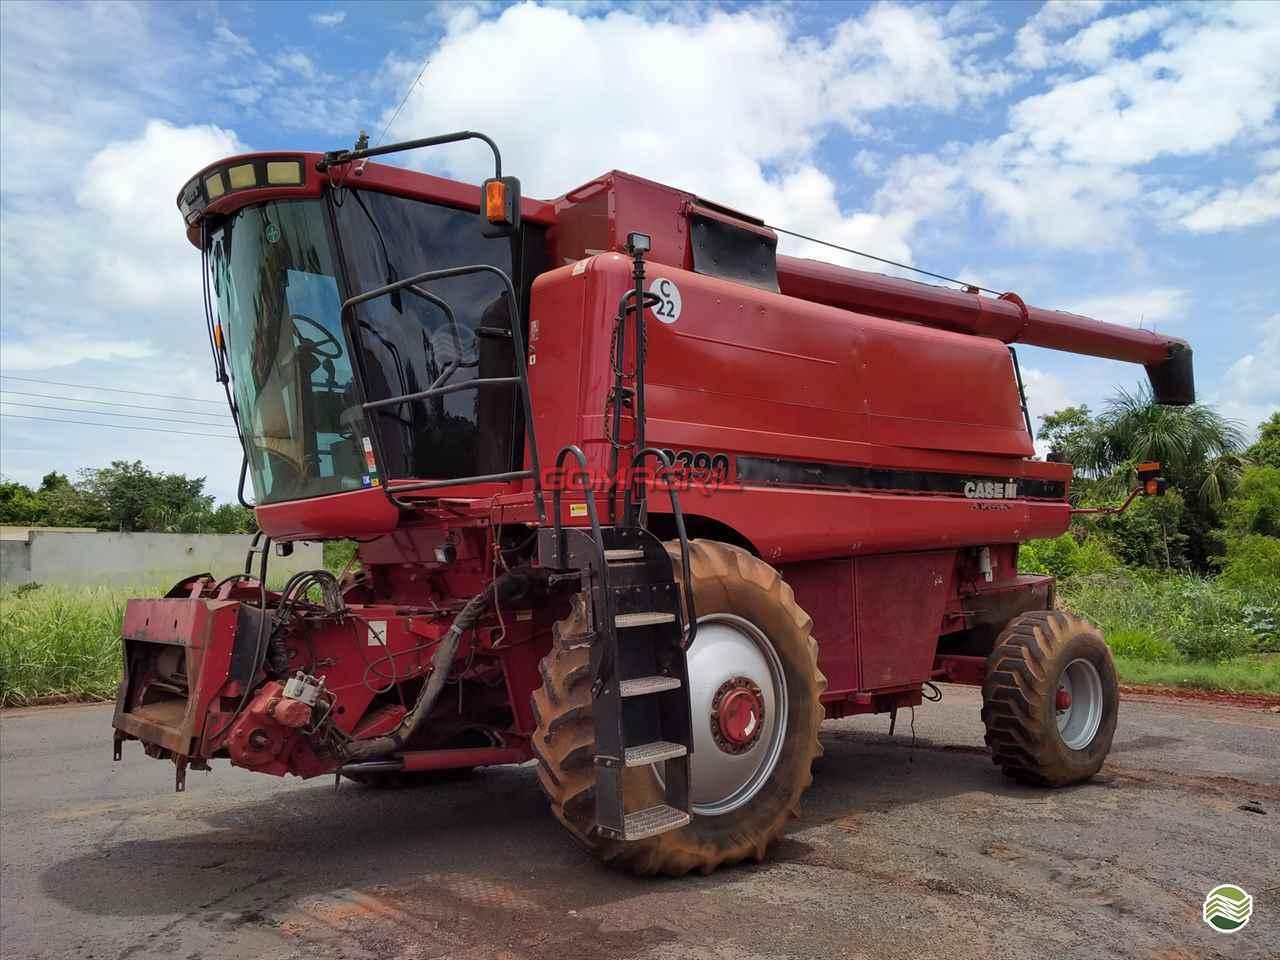 CASE 2399 de Gomagril Máquinas Agrícolas - TANGARA DA SERRA/MT